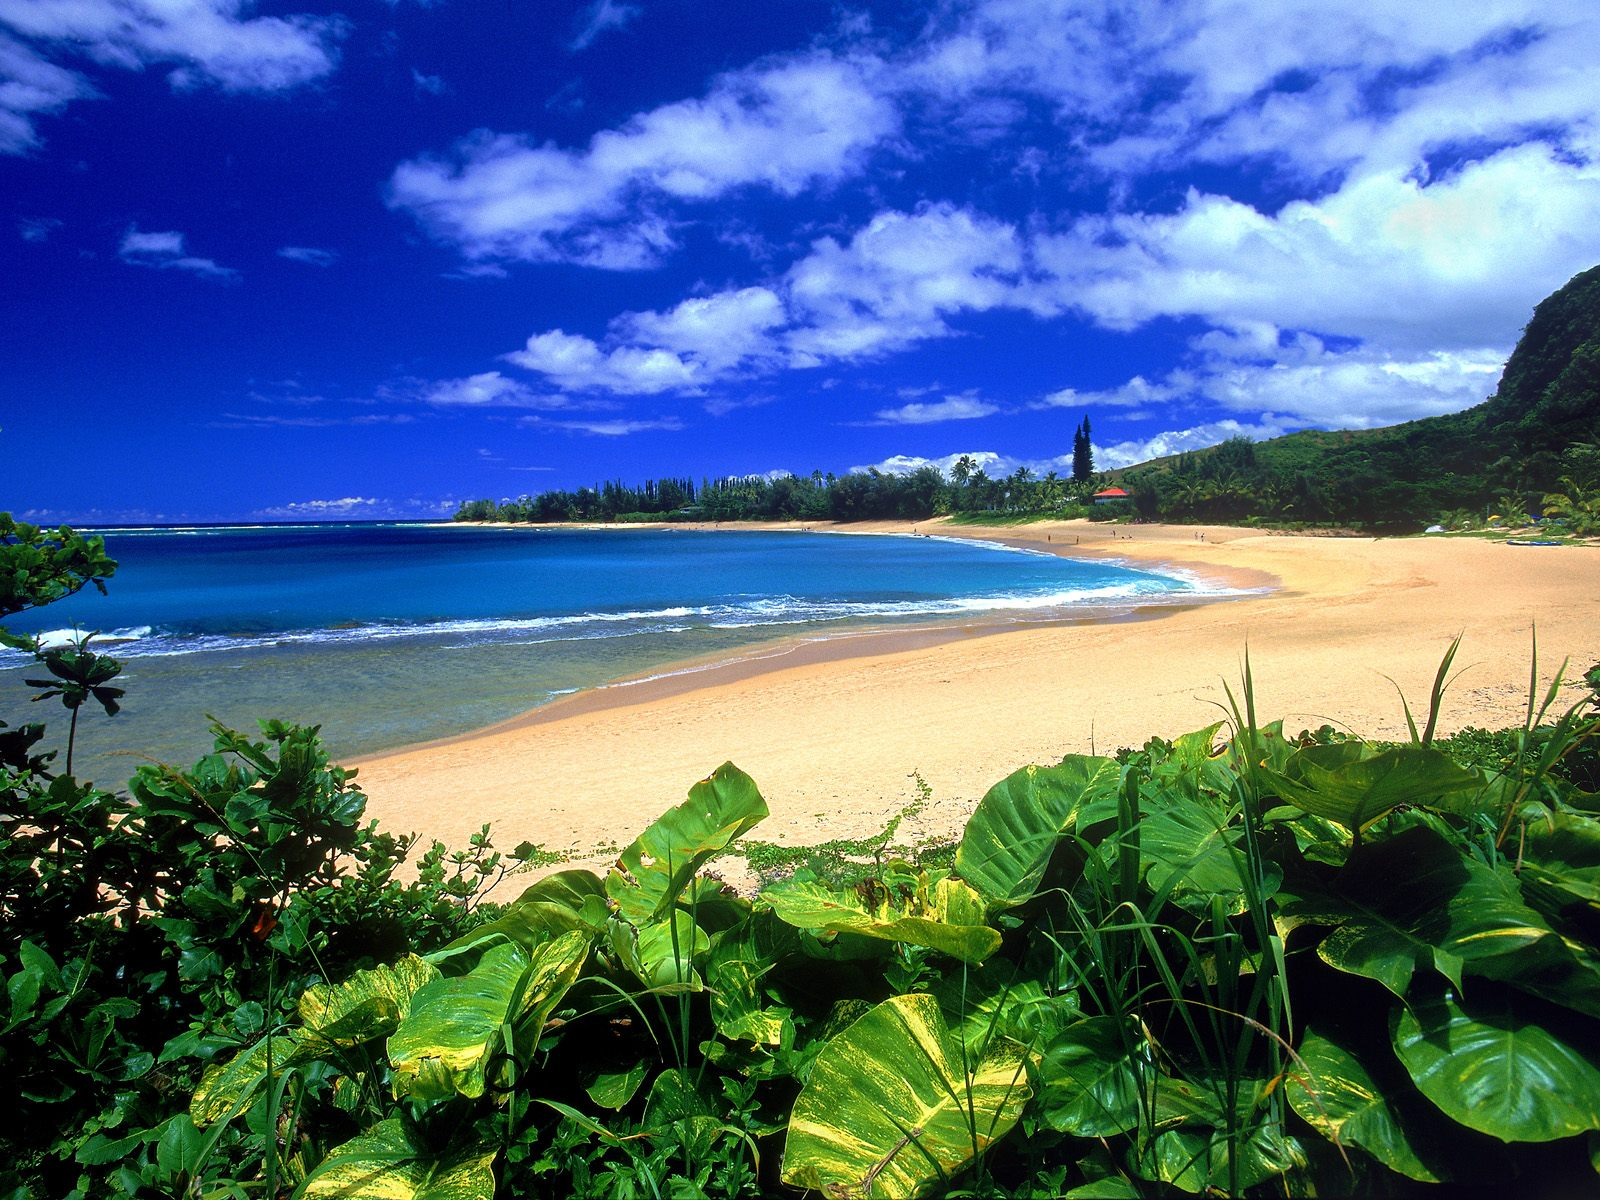 http://2.bp.blogspot.com/-VG72187RrME/UHaBshnBh0I/AAAAAAAAIrQ/oApj0Ja1uaI/s1600/beach-wallpaper-hd-52.jpg